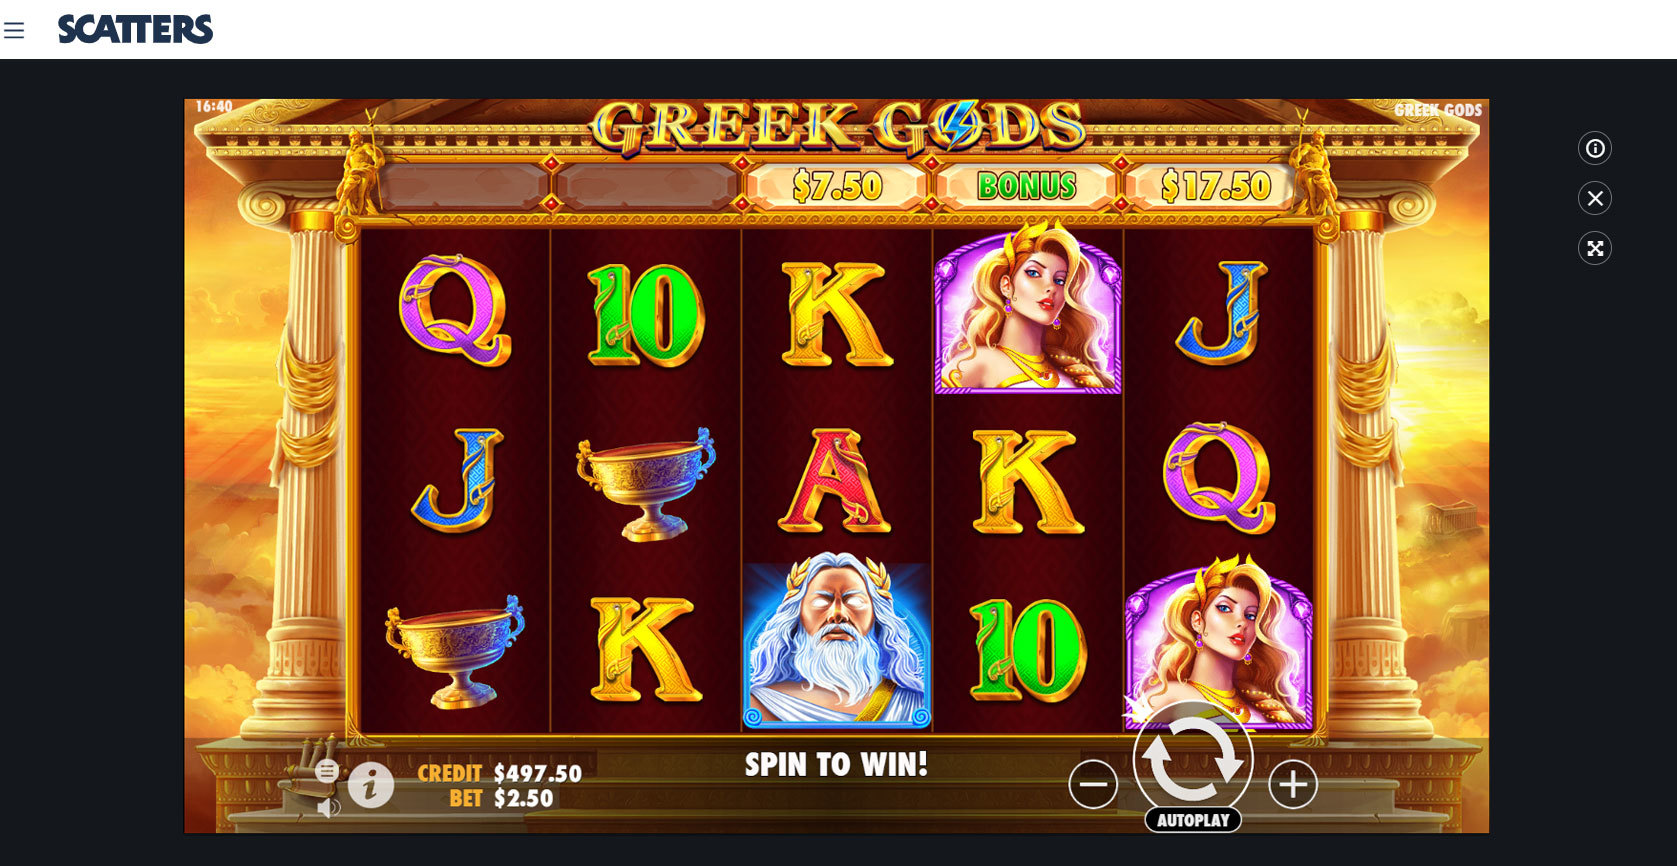 Greek Gods Online Slot - Scatters Slots Casino